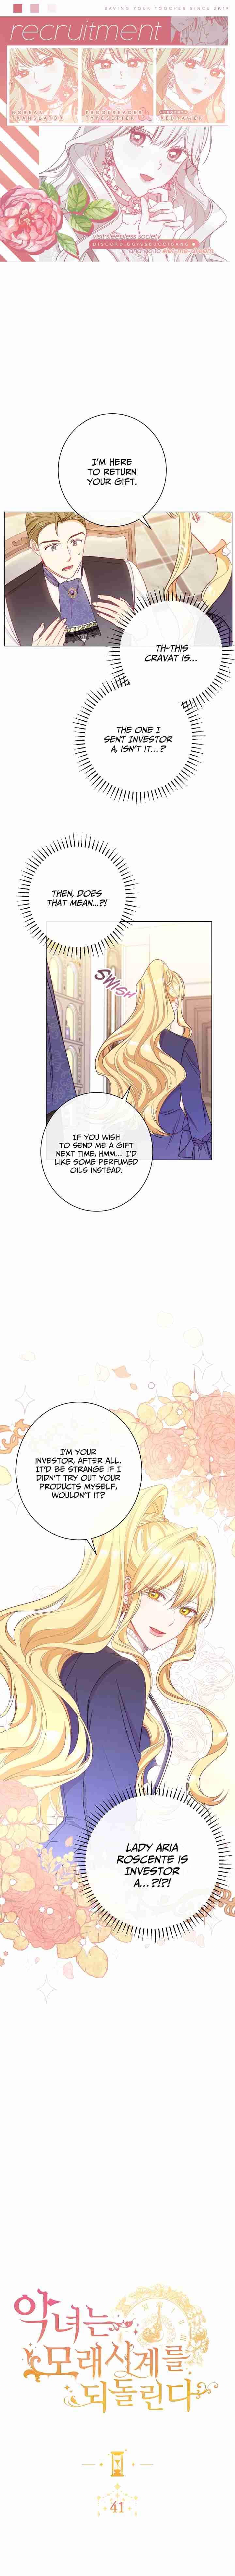 https://manga.mangadogs.com/comics/pic4/51/35315/2073029/4db7ccb92989c6ca0e98dadb5c784ba7.jpg Page 1